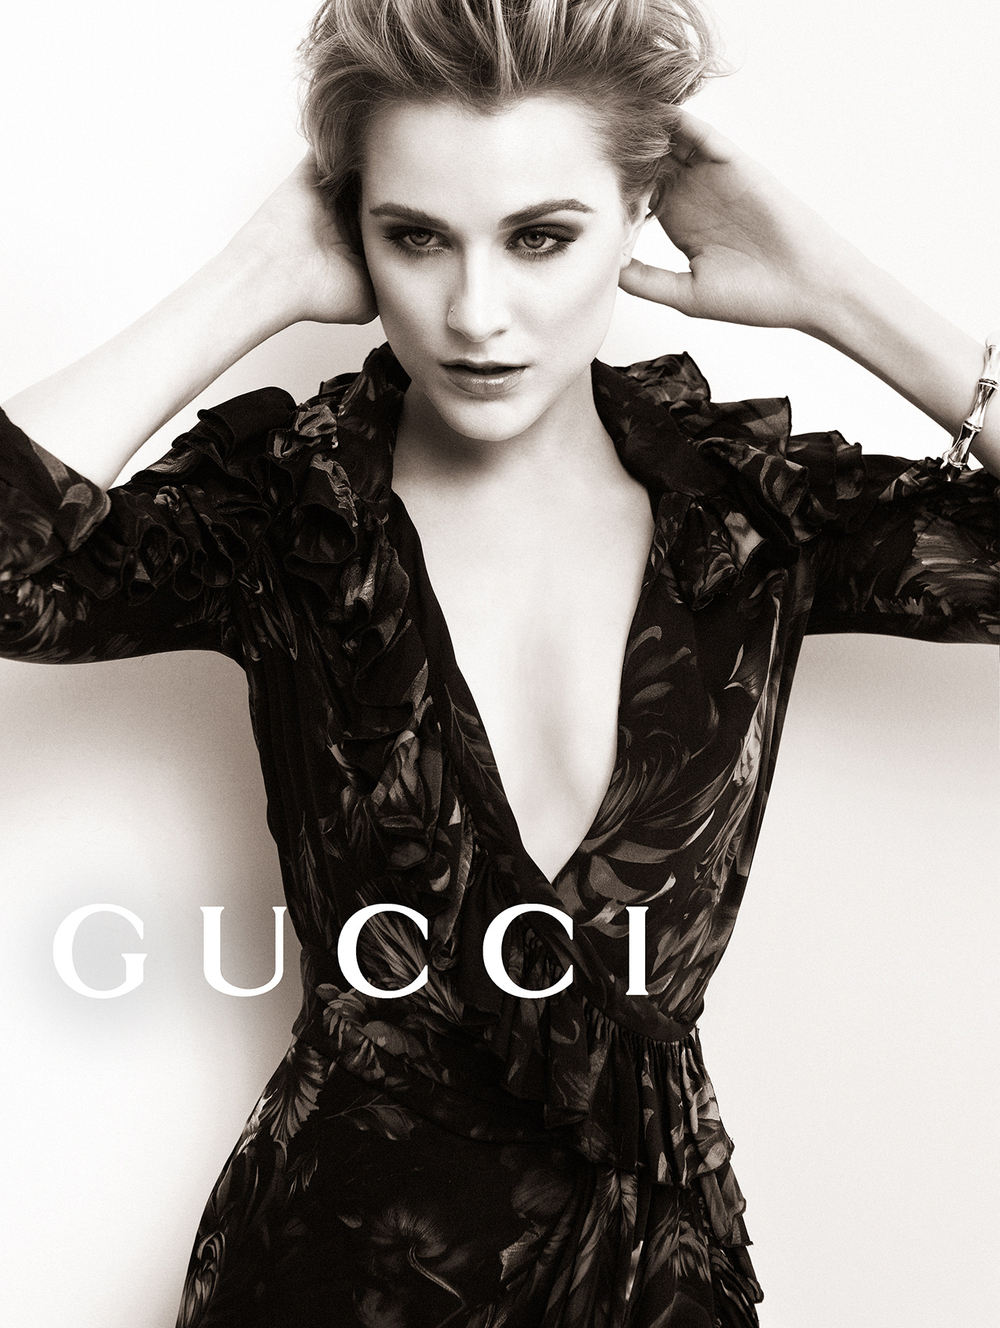 EvanRachel_Wood_Gucci_003.jpg